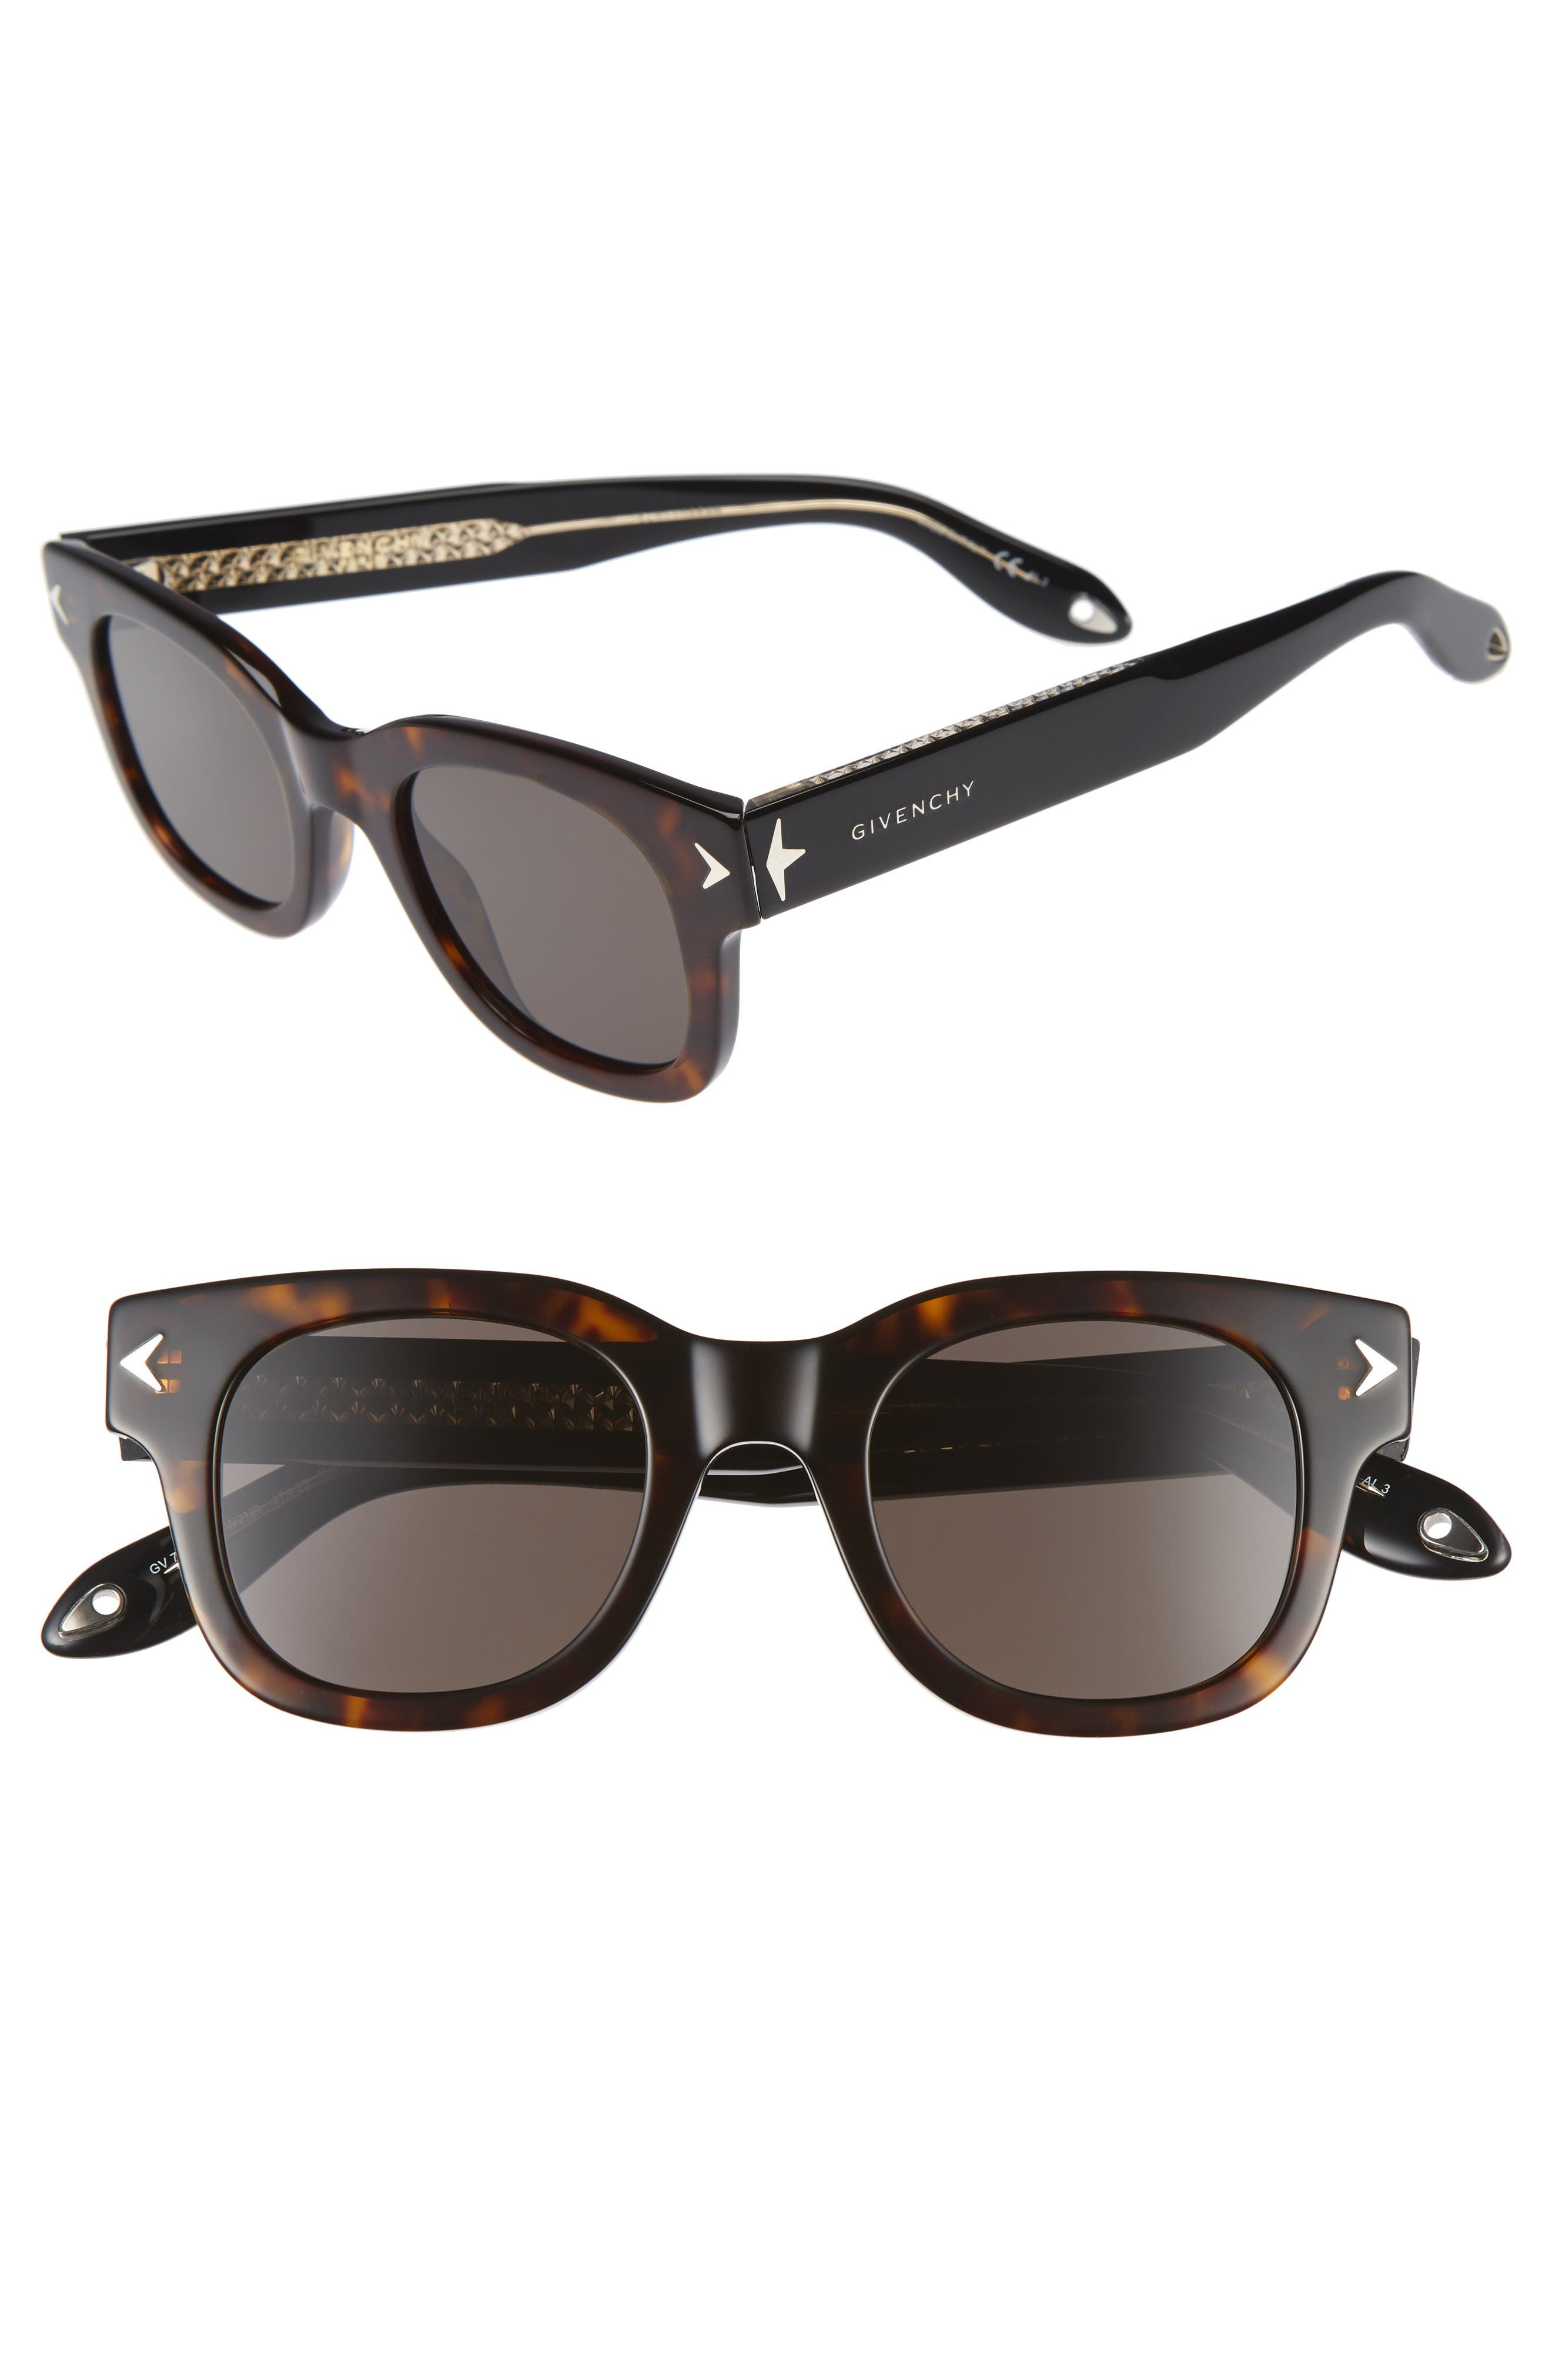 Main Image - Givenchy 7037/S 47mm Sunglasses